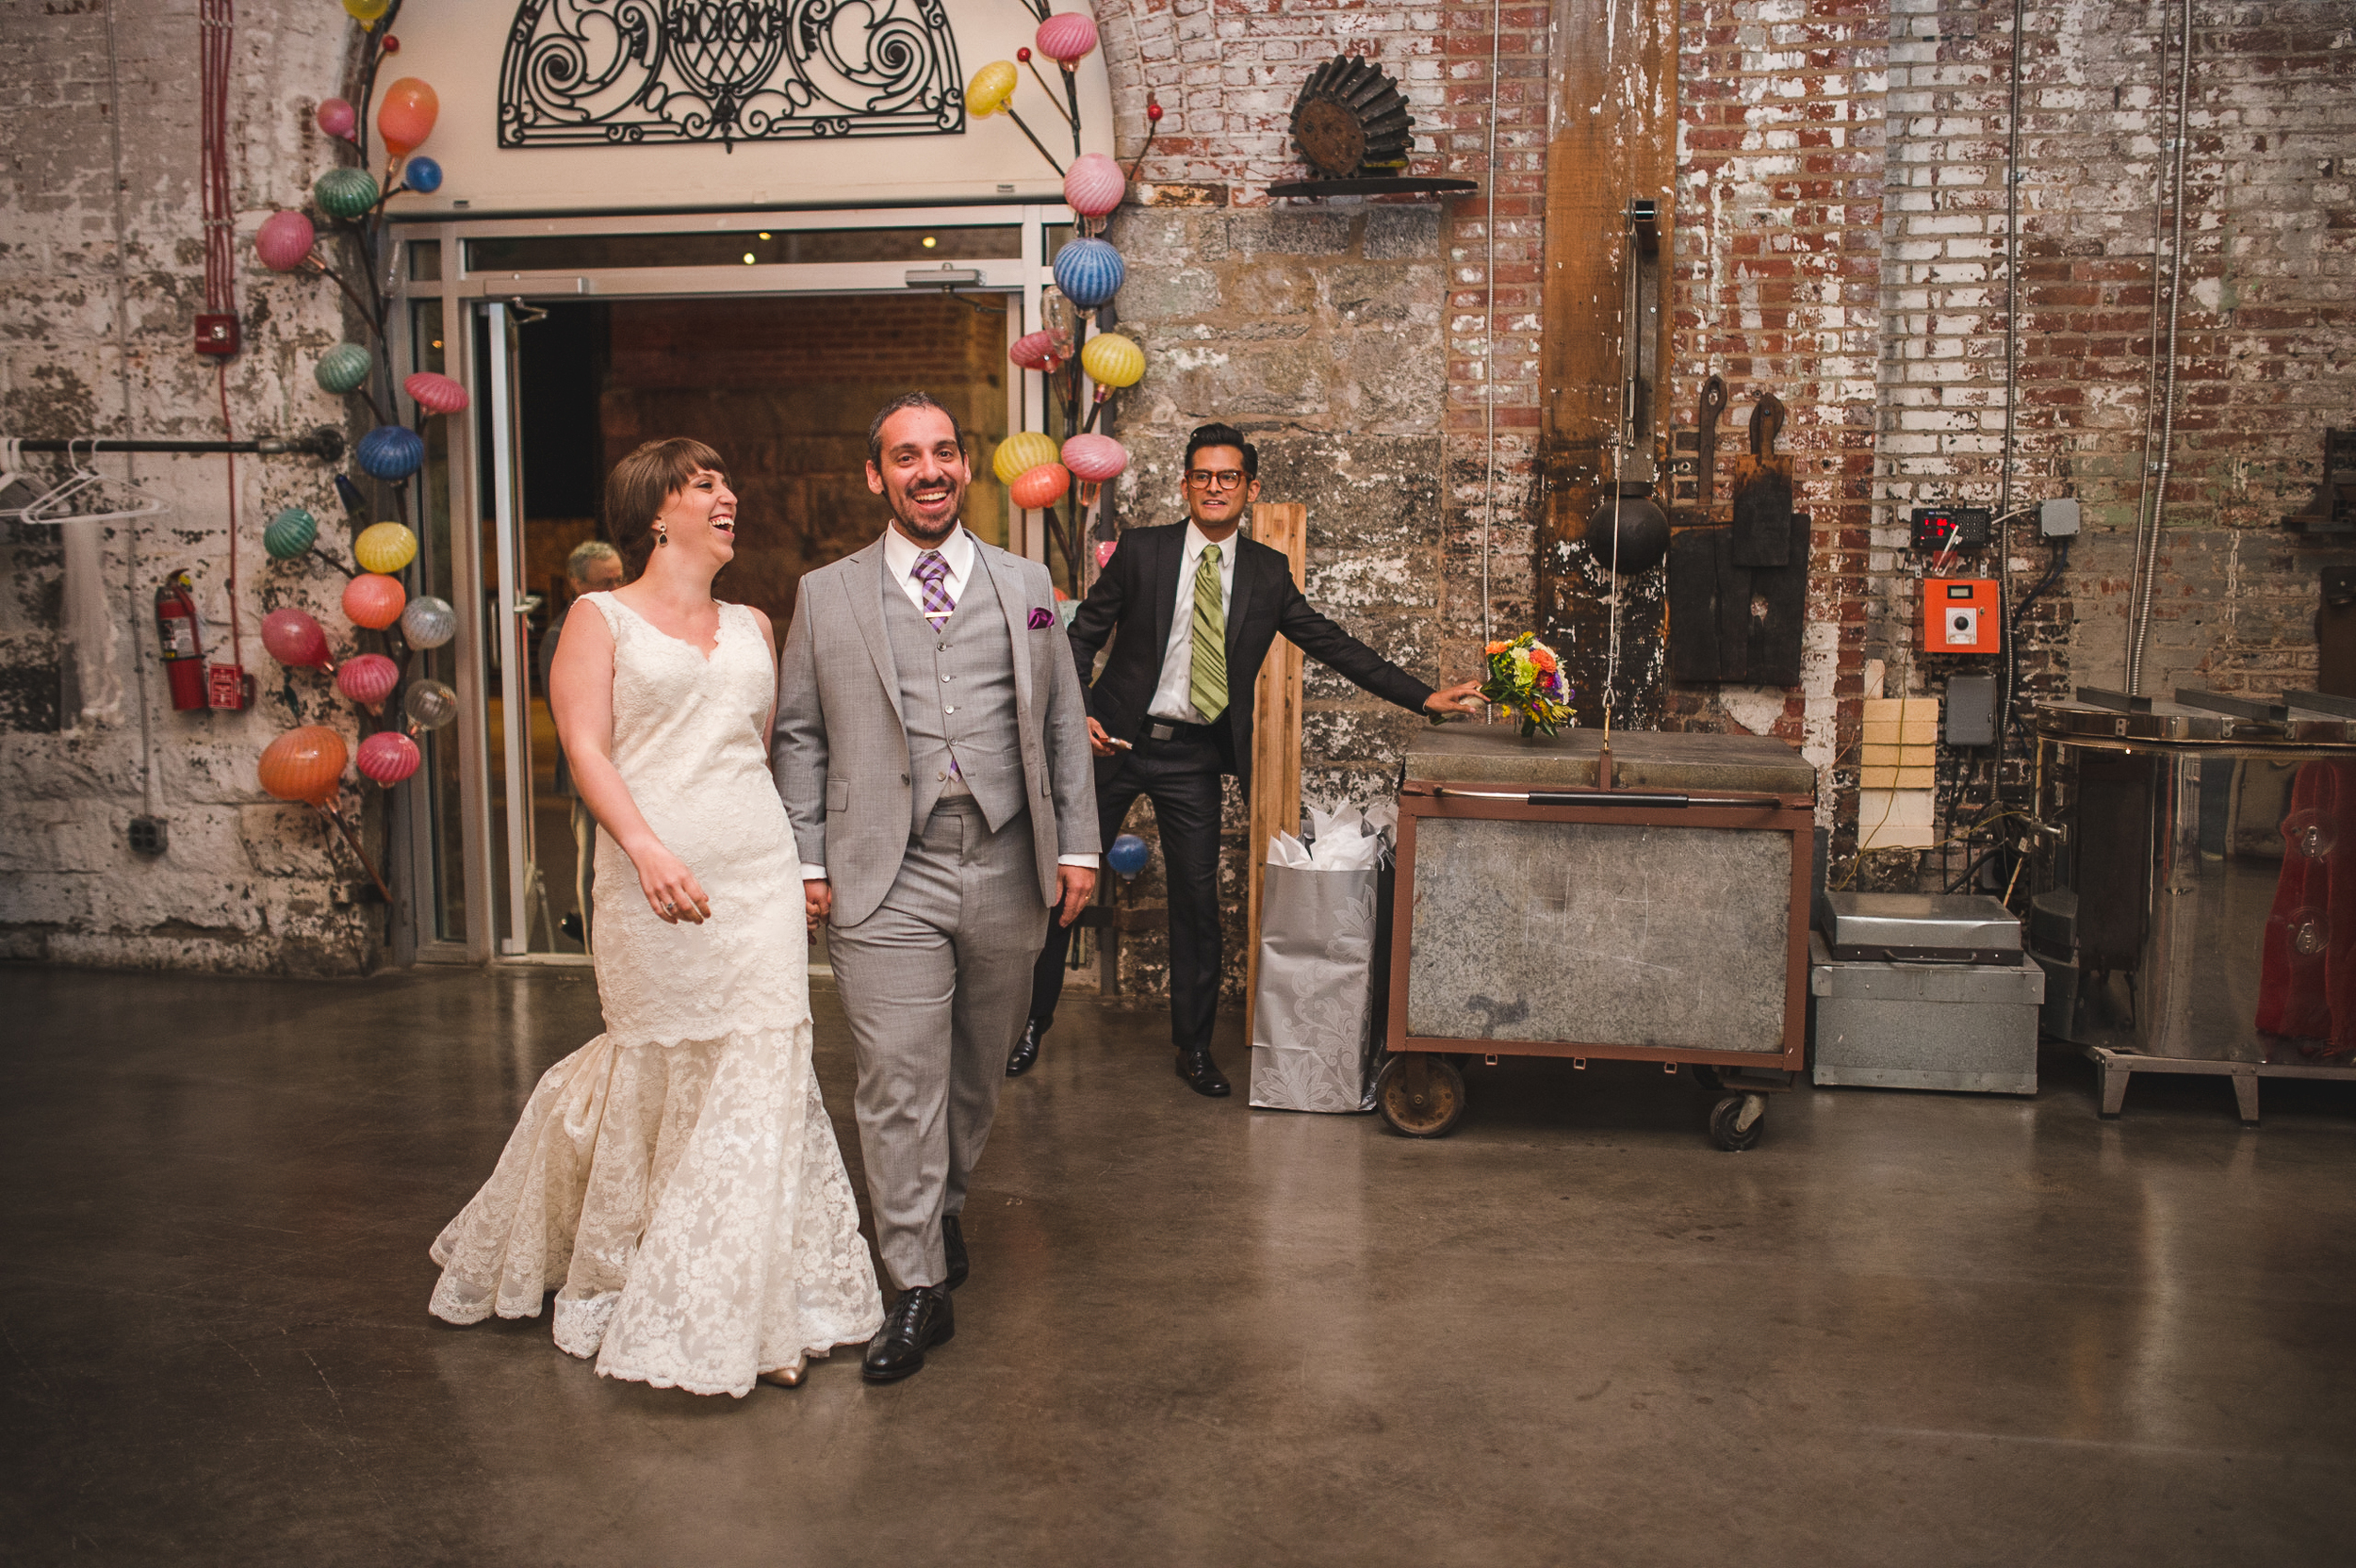 Documentary wedding photographer washington dc Mantas Kubilinskas Photography_-25.jpg